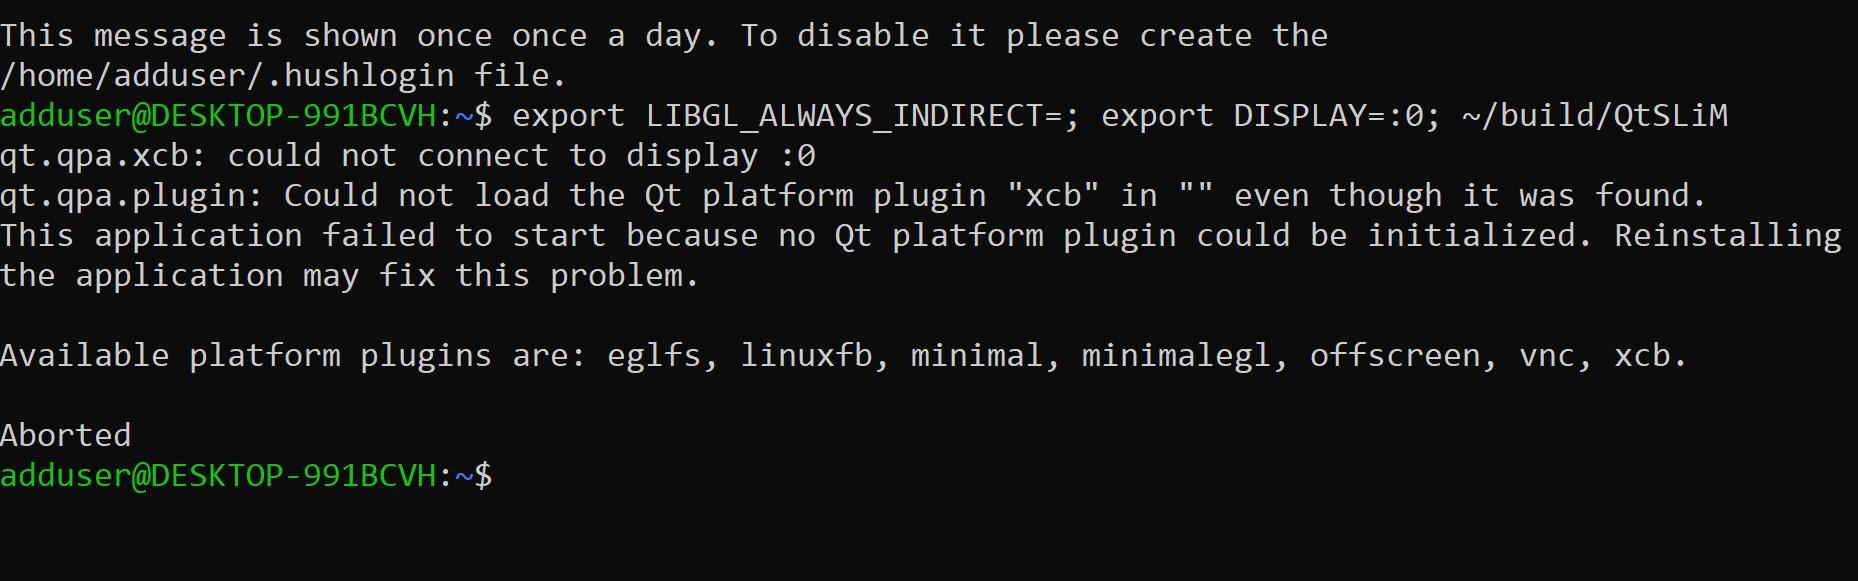 ubuntu issue.PNG